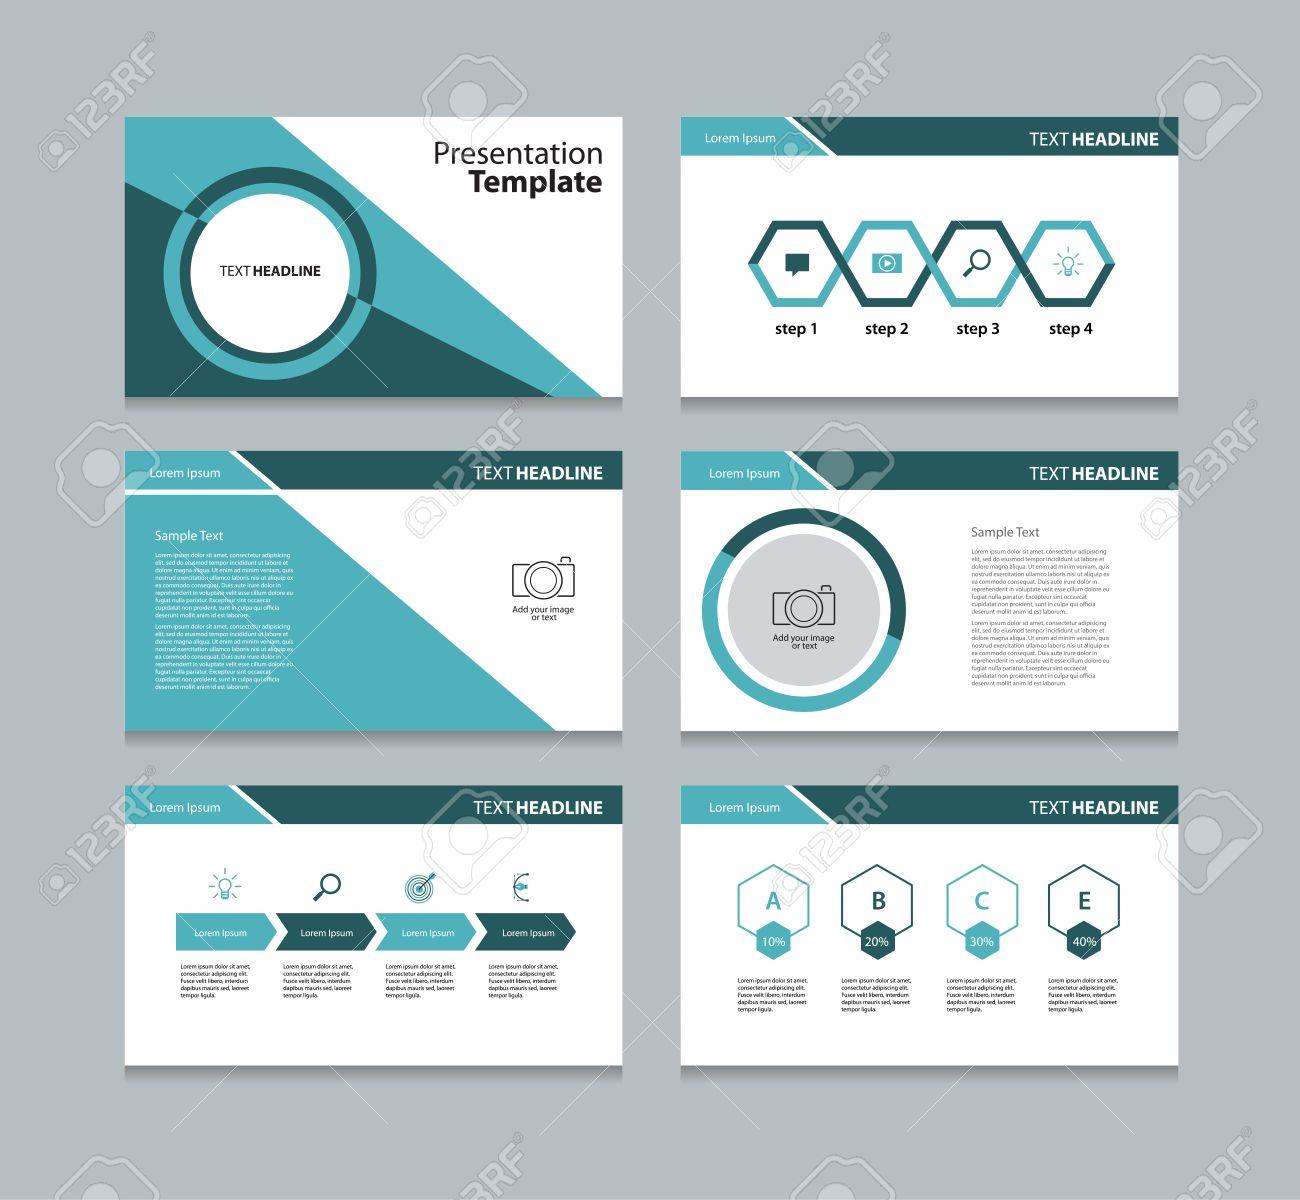 business template presentation slide background design royalty free